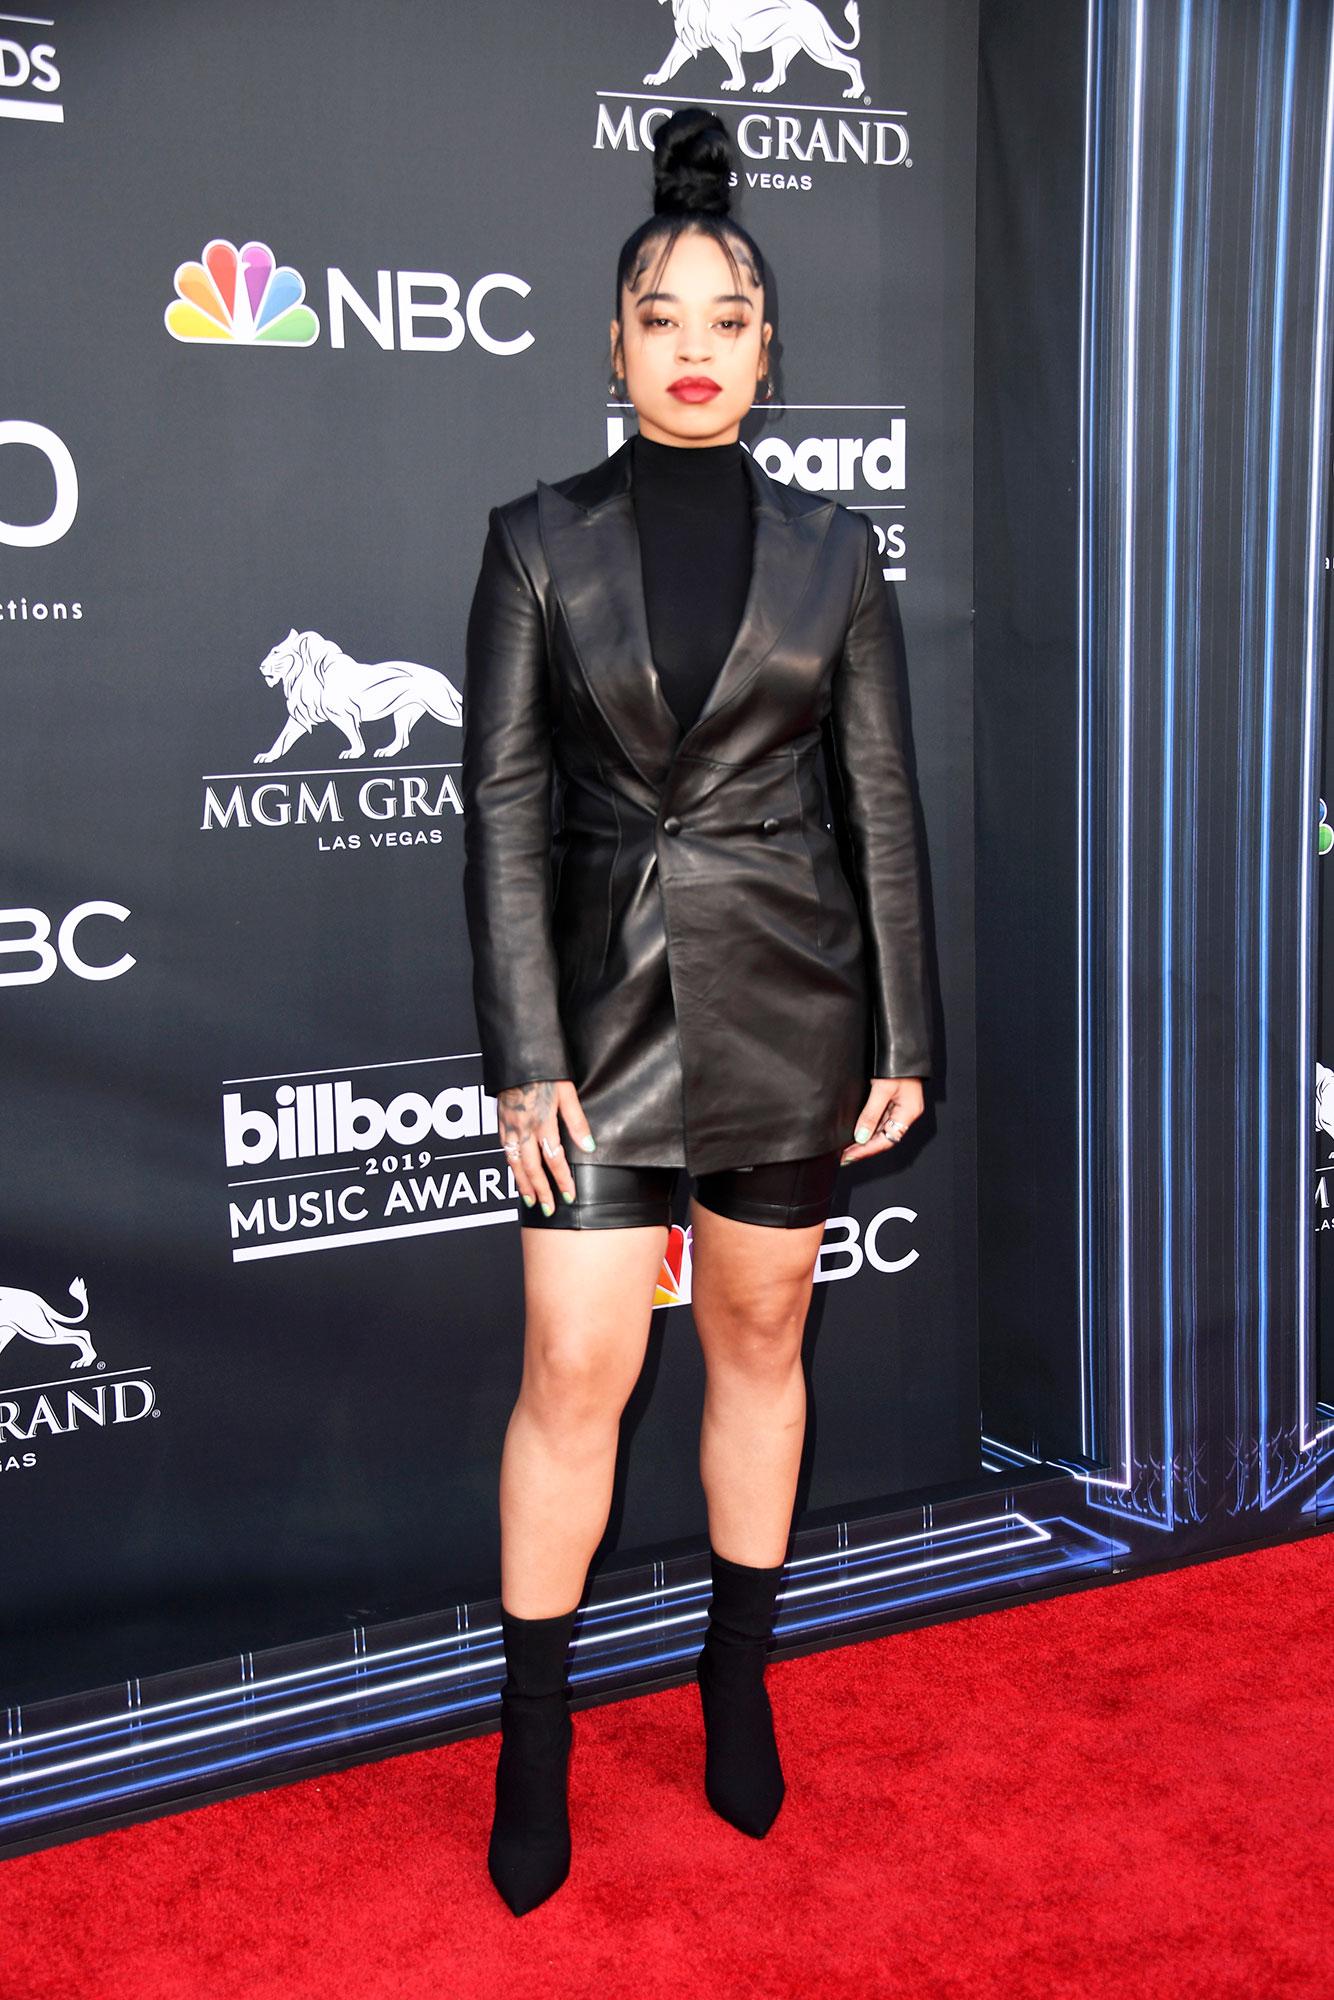 14079a4f0e8f Billboard Music Awards 2019 Red Carpet Fashion  See Celeb Dresses